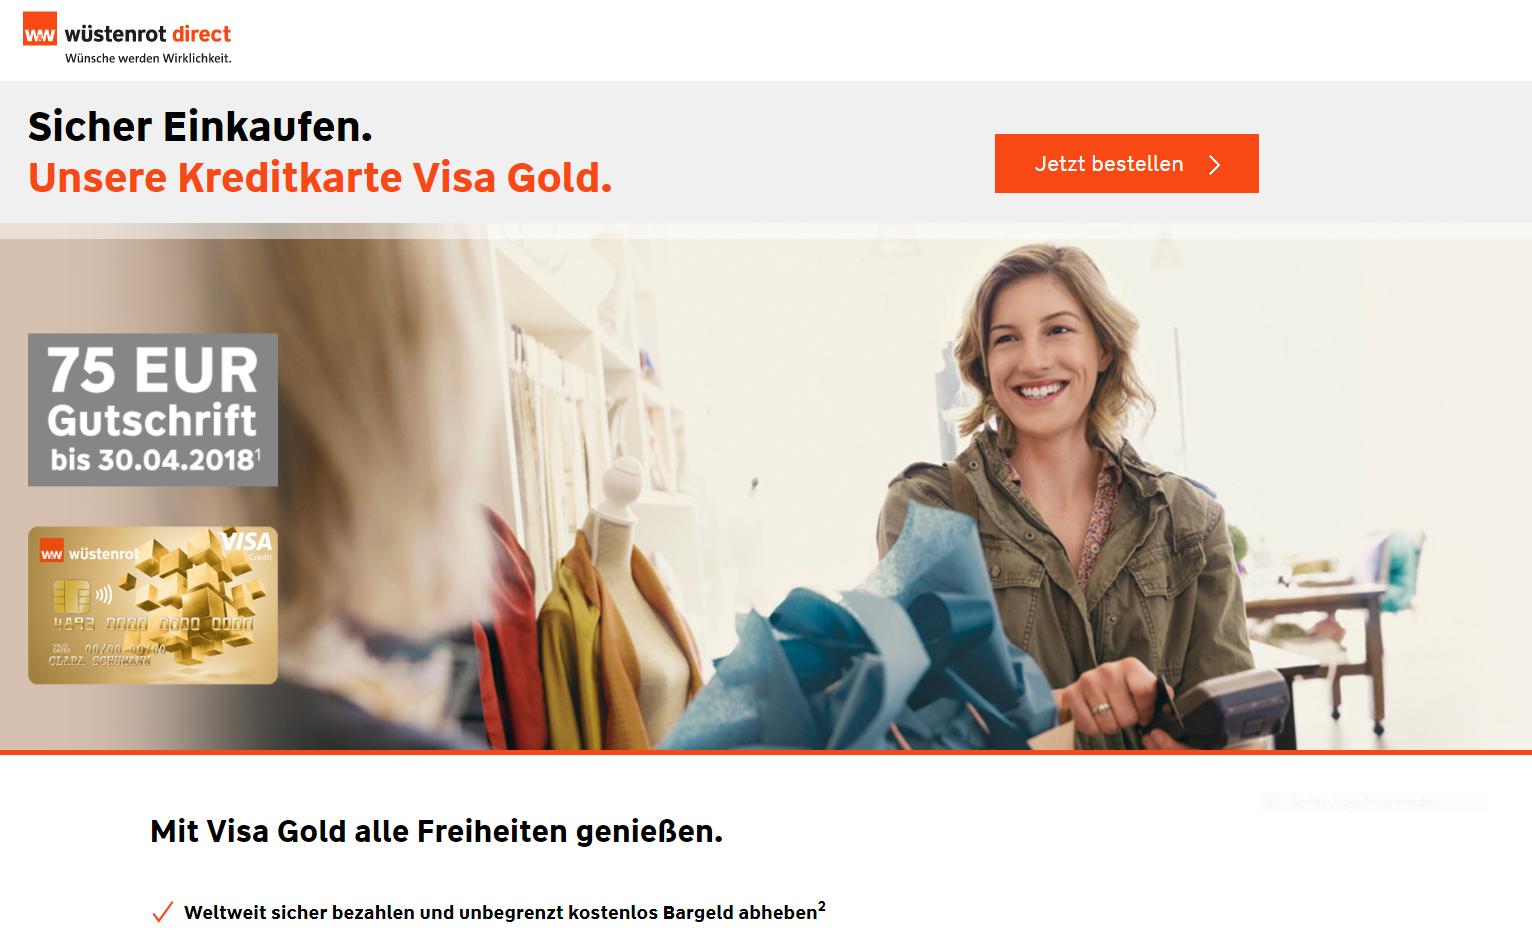 Wüstenrot & Württembergische Visa Gold Kreditcard